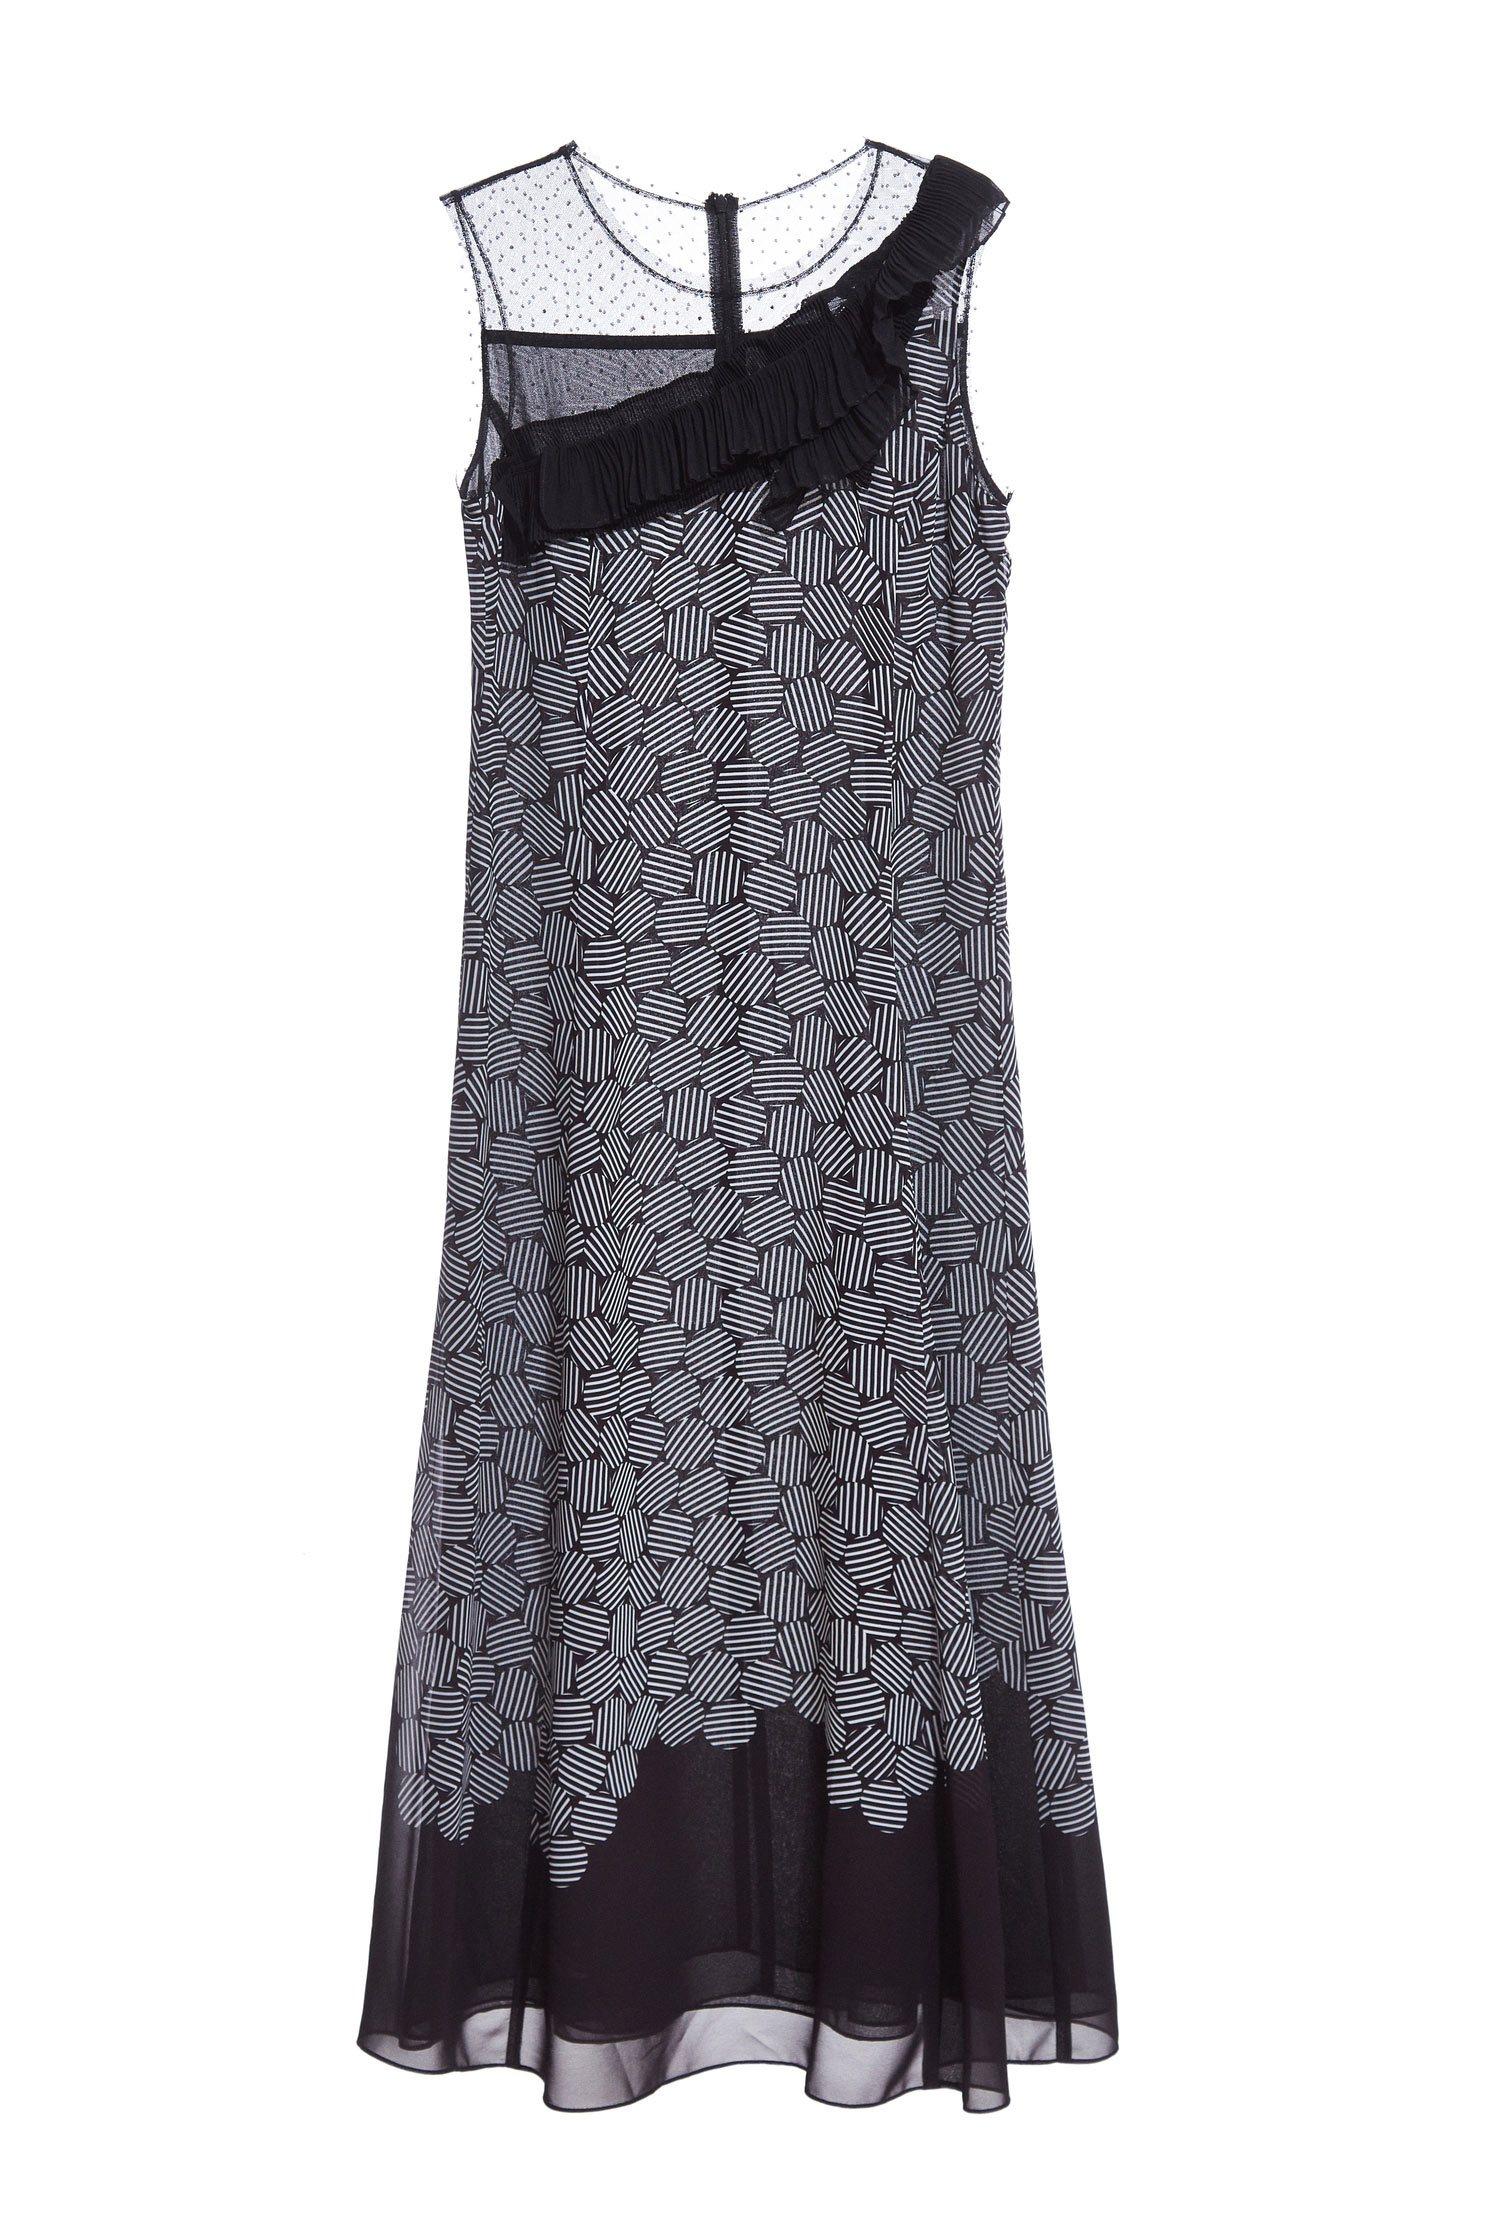 Charming solid flounce dress